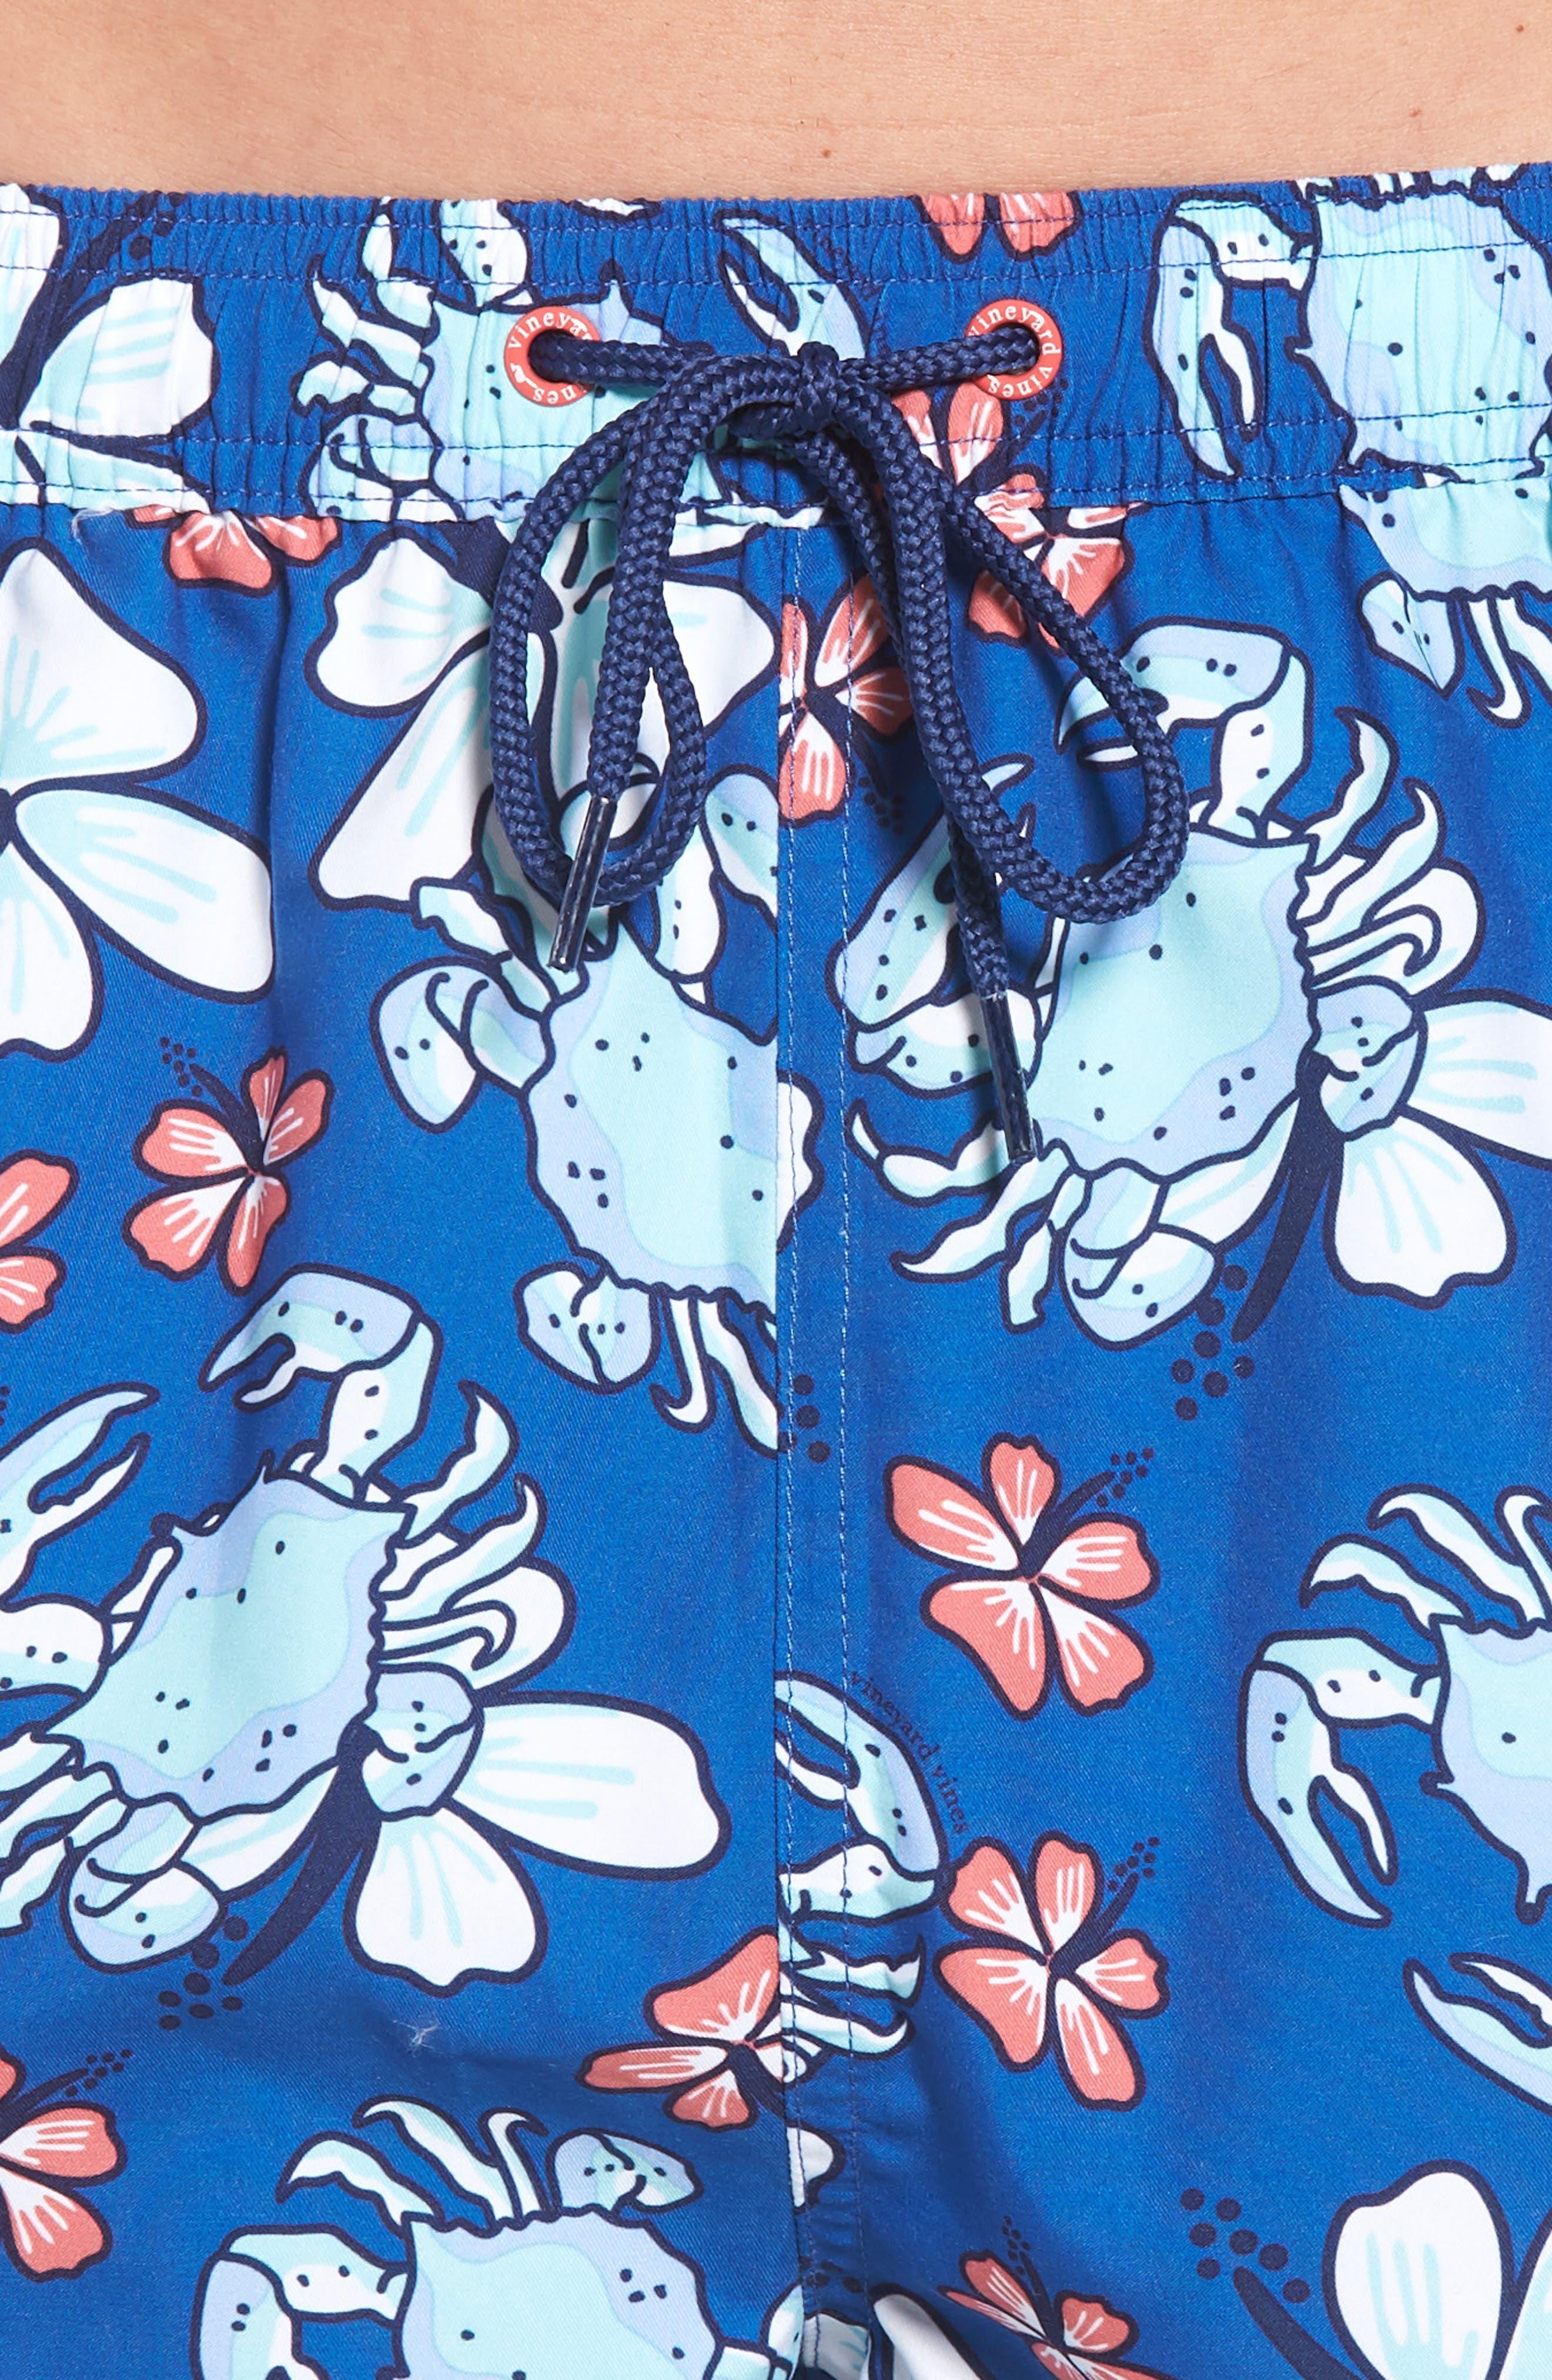 Chappy Crab Floral Swim Trunks,                             Alternate thumbnail 4, color,                             Yacht Blue